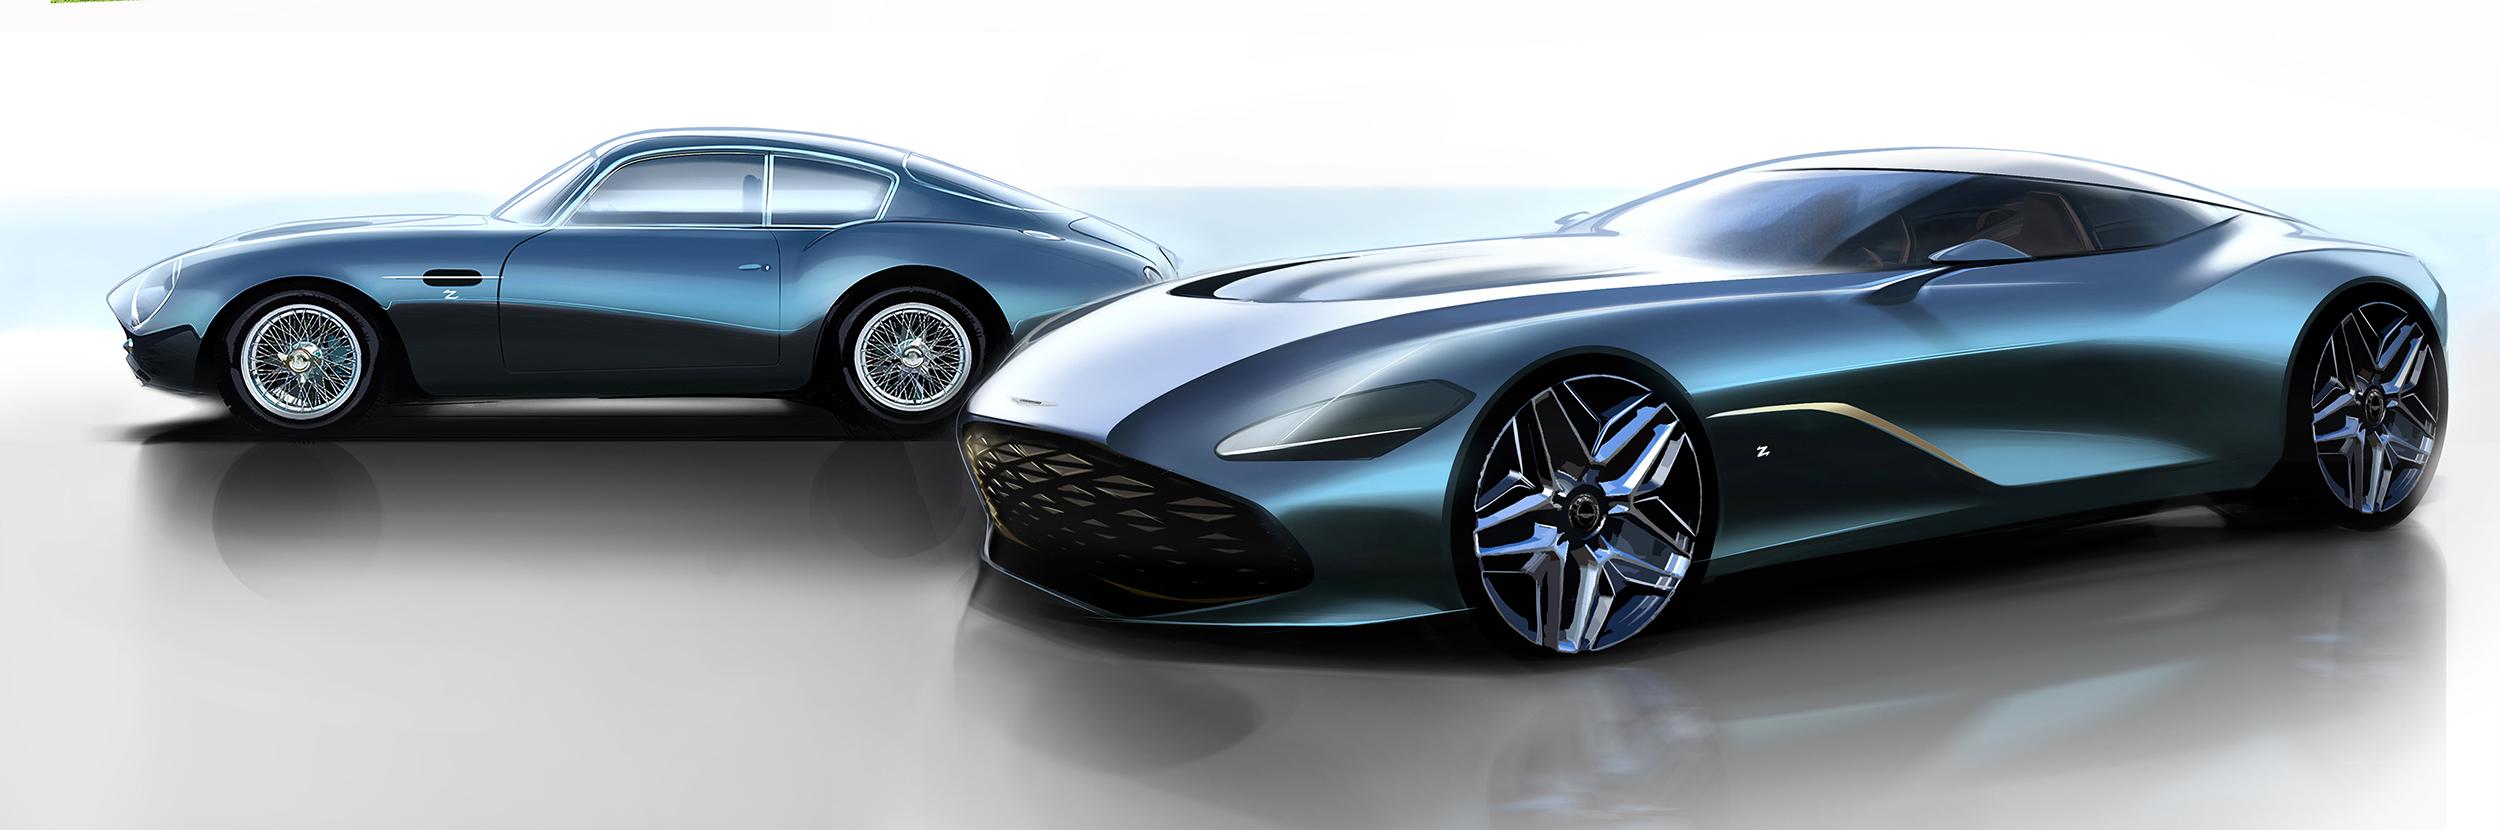 2020 Aston Martin Dbs Gt Zagato Ateliers